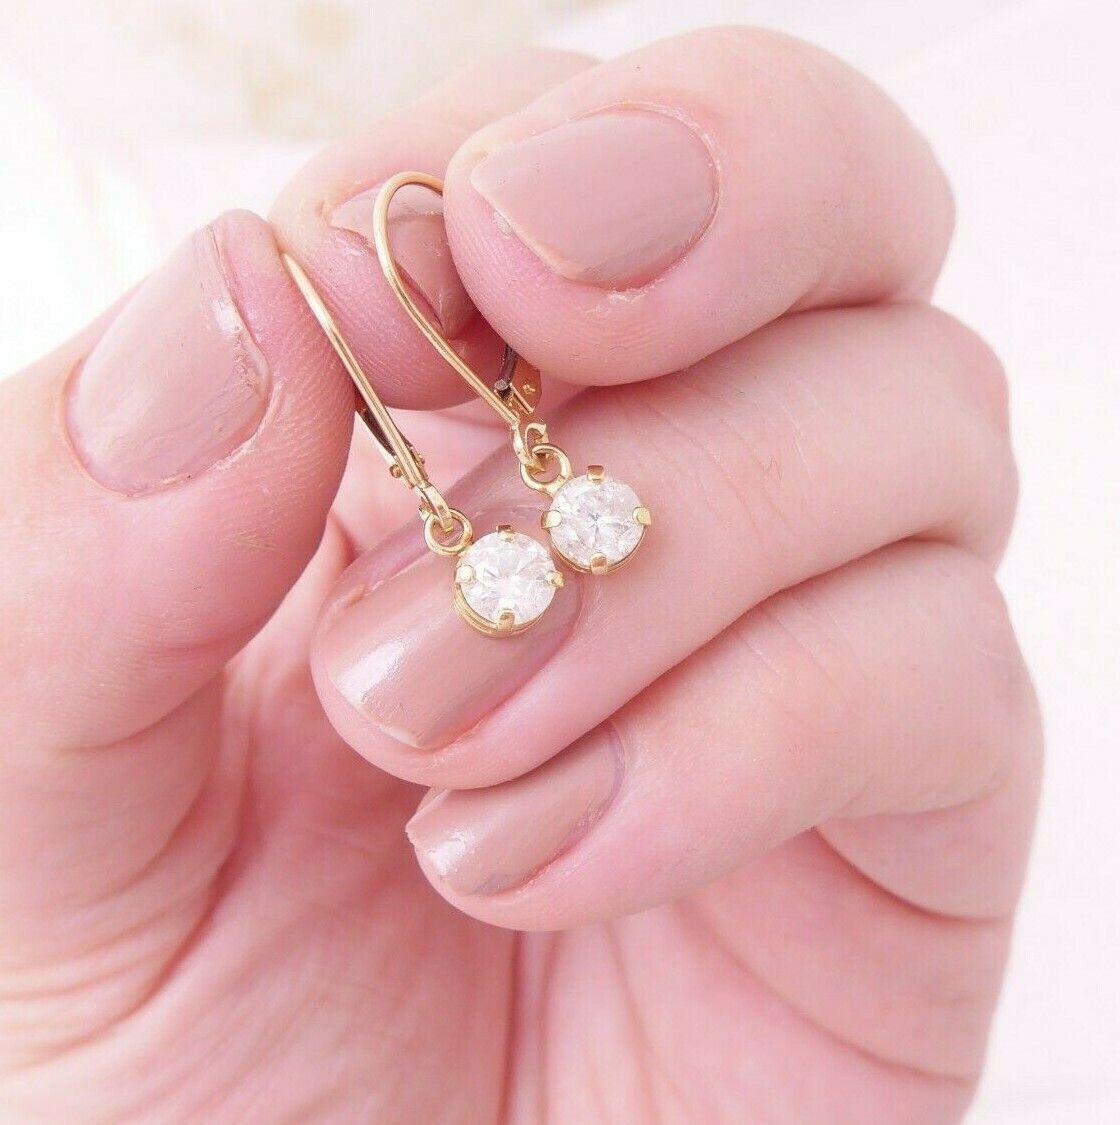 18ct gold 3/4ct diamond earrings, 18k 750